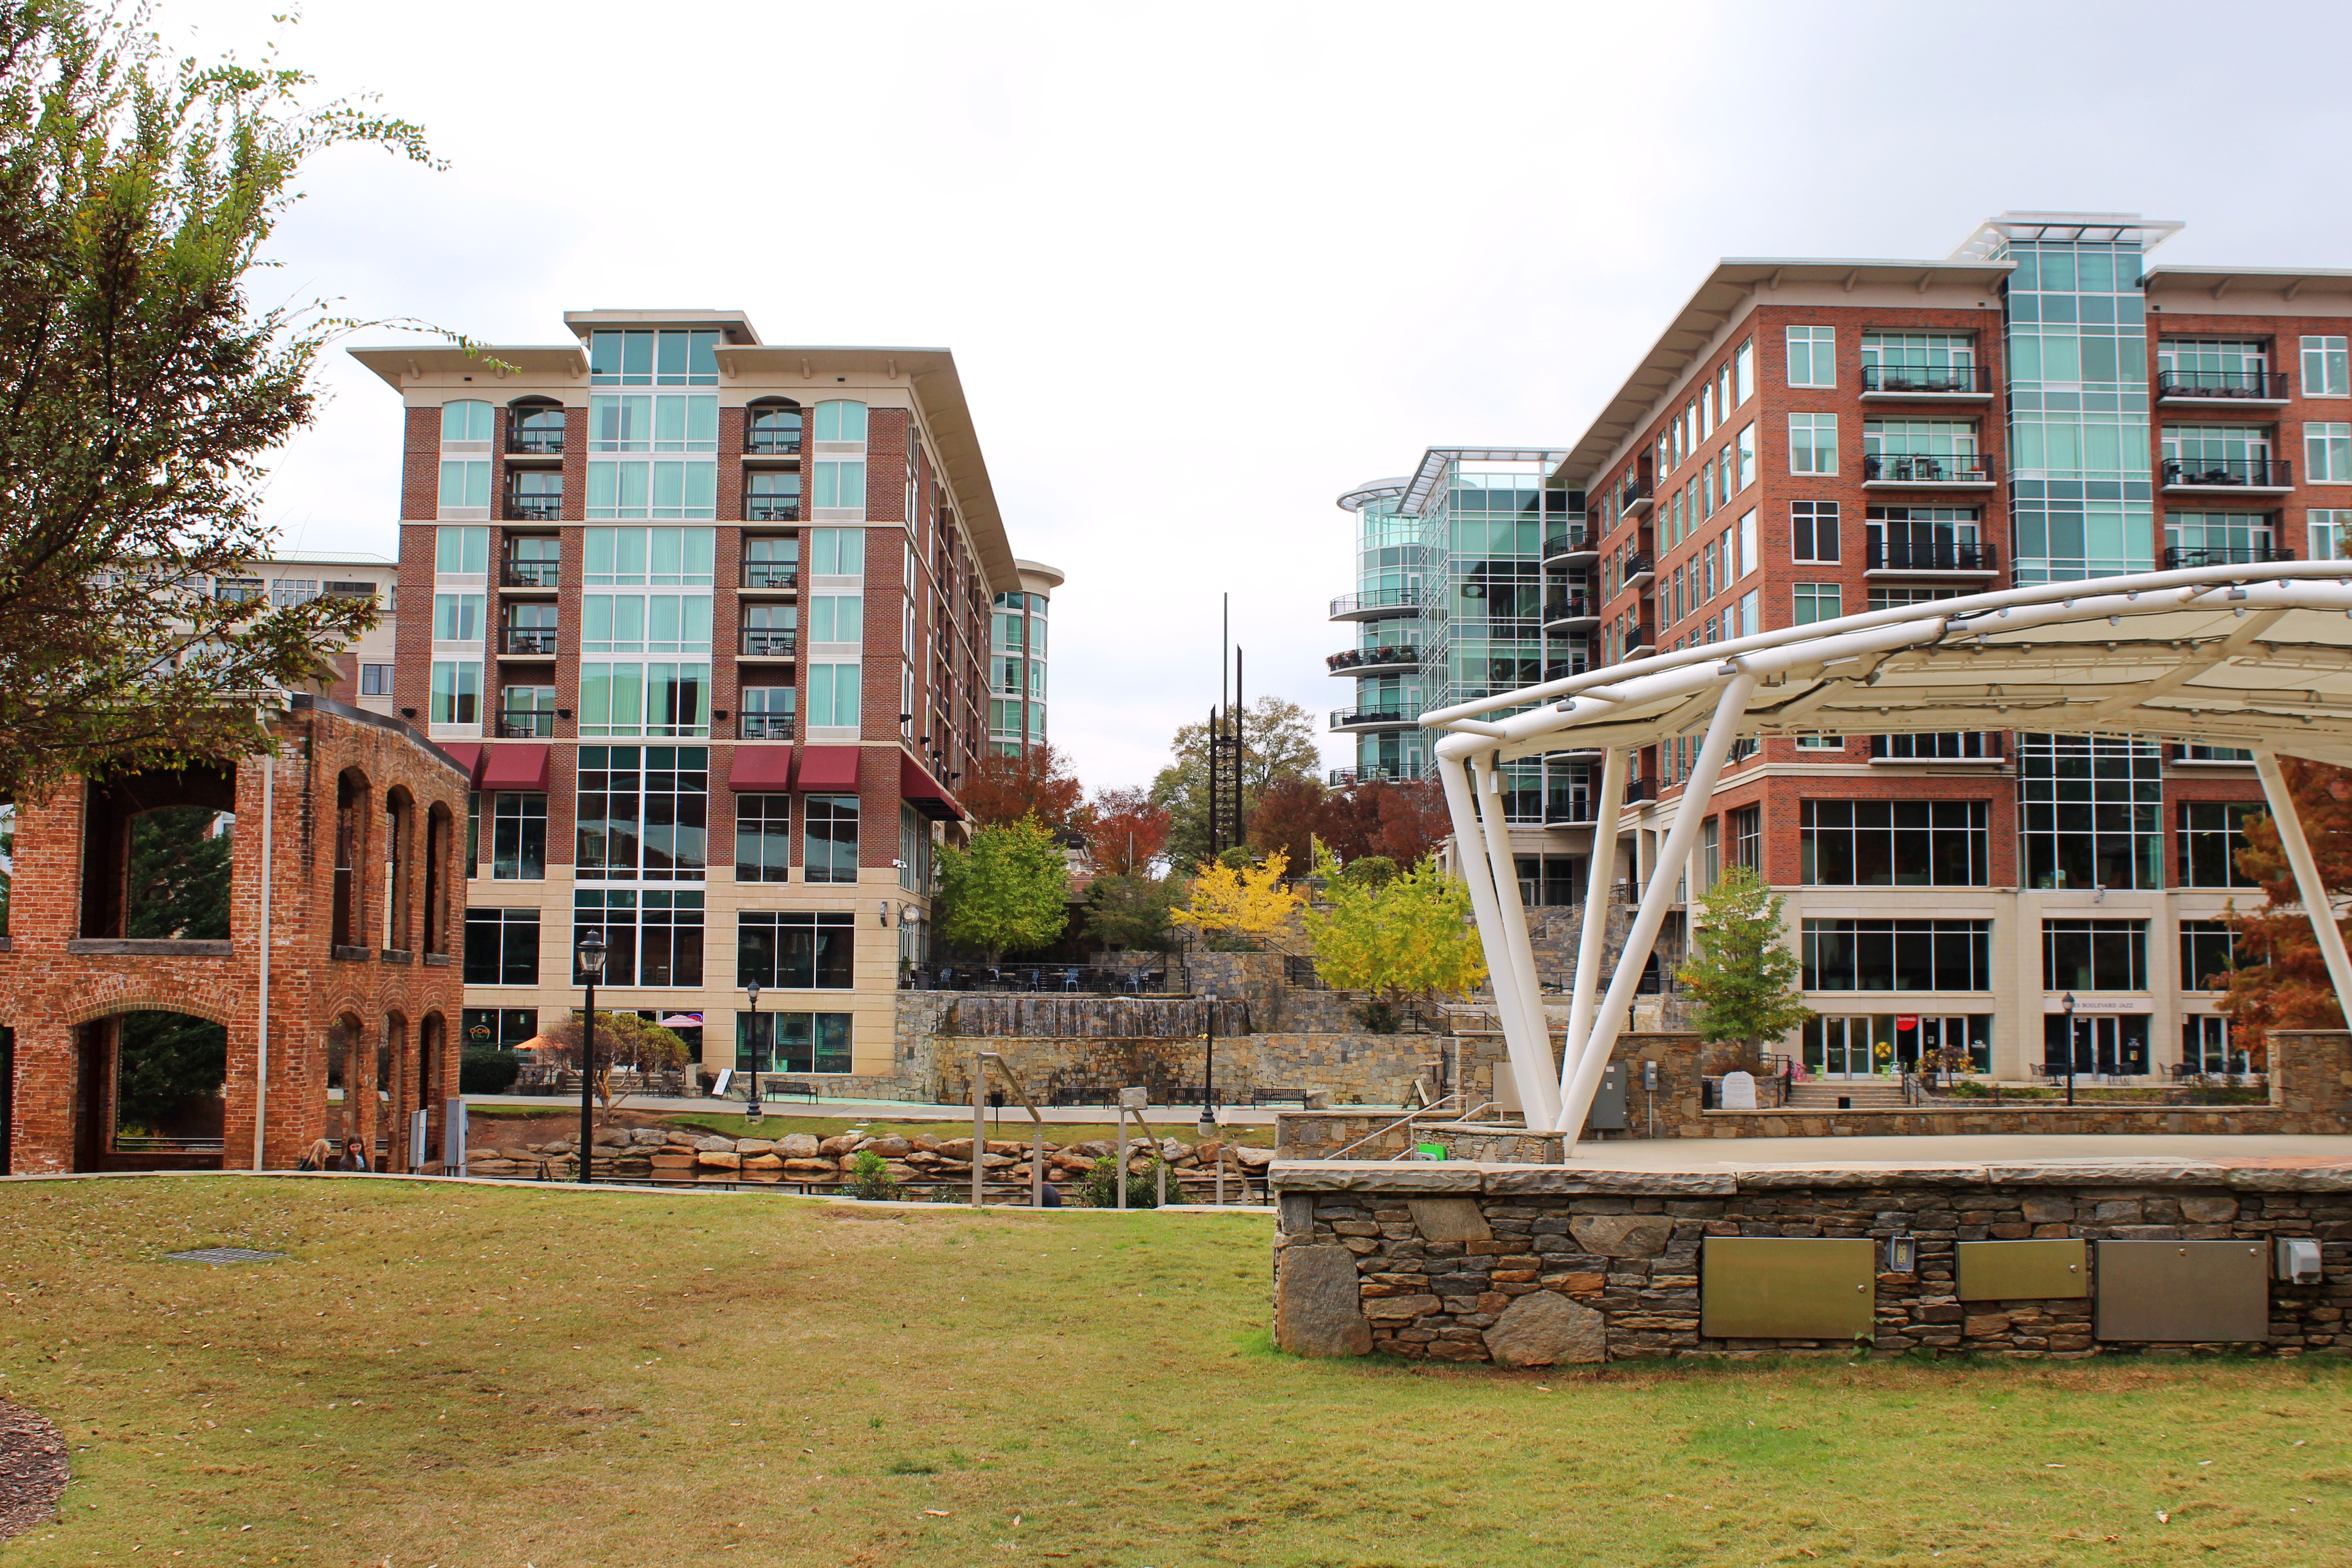 Amazing Place: Six Cities Using the New Recipe for Economic Development